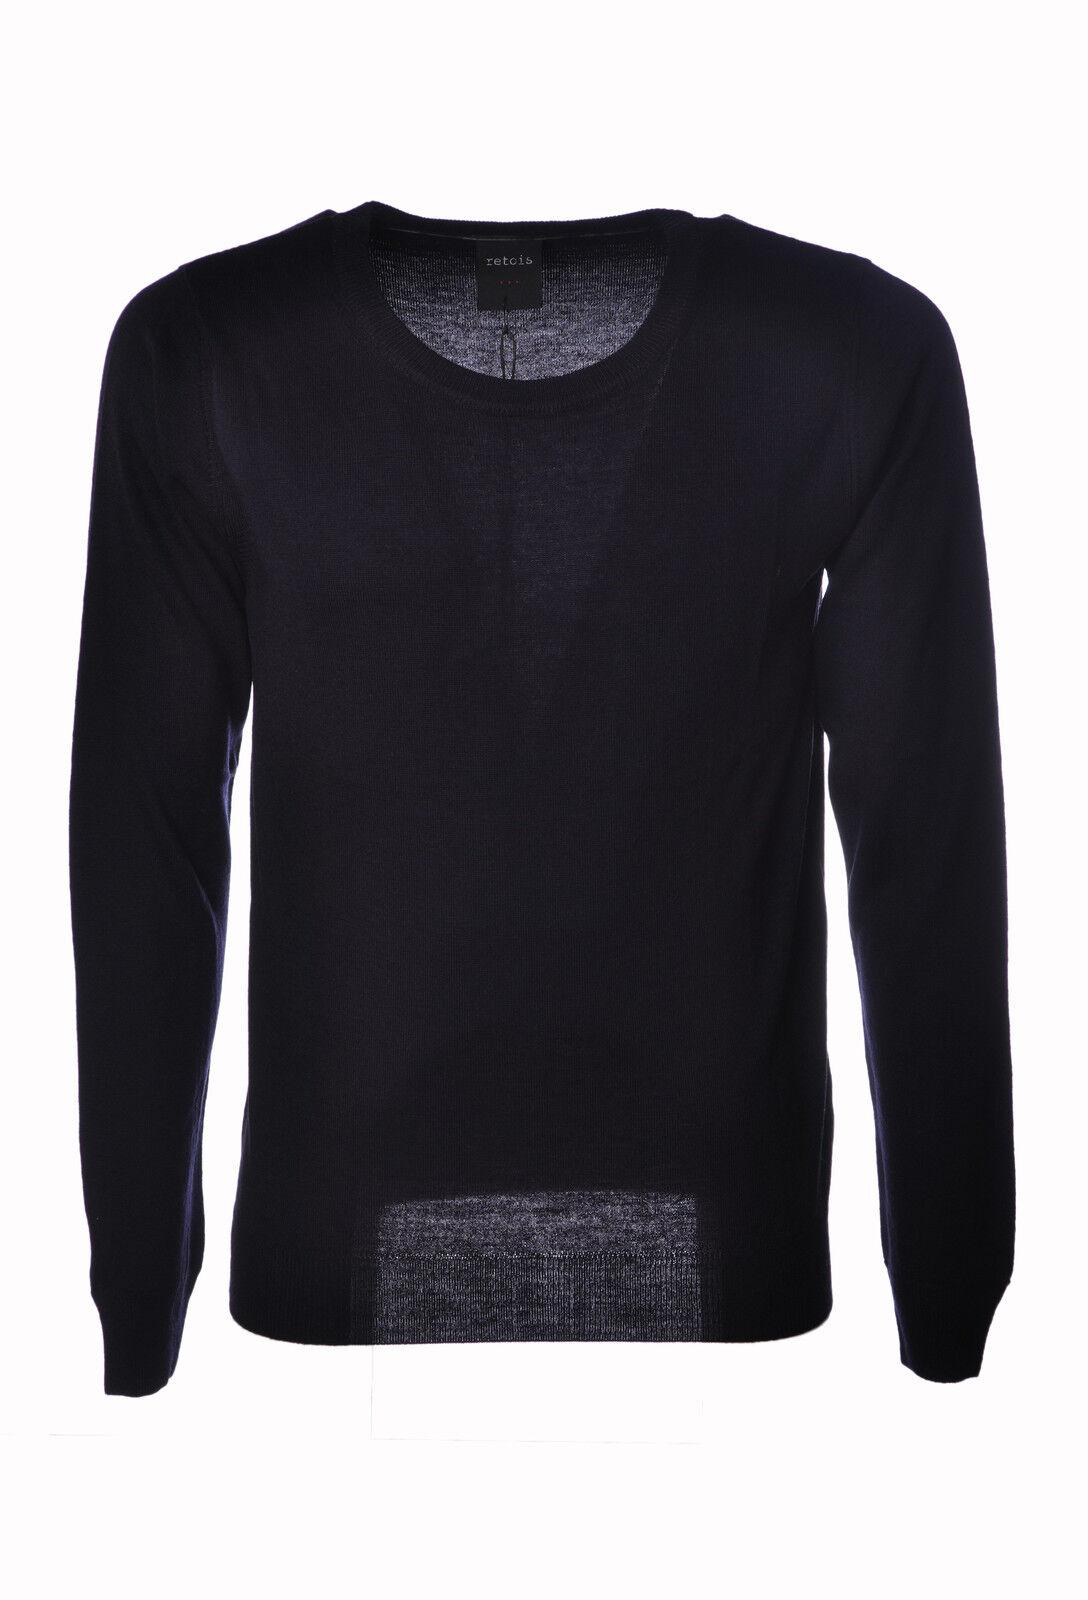 Retois  -  Sweaters - Male - Blau - 3861630A184049